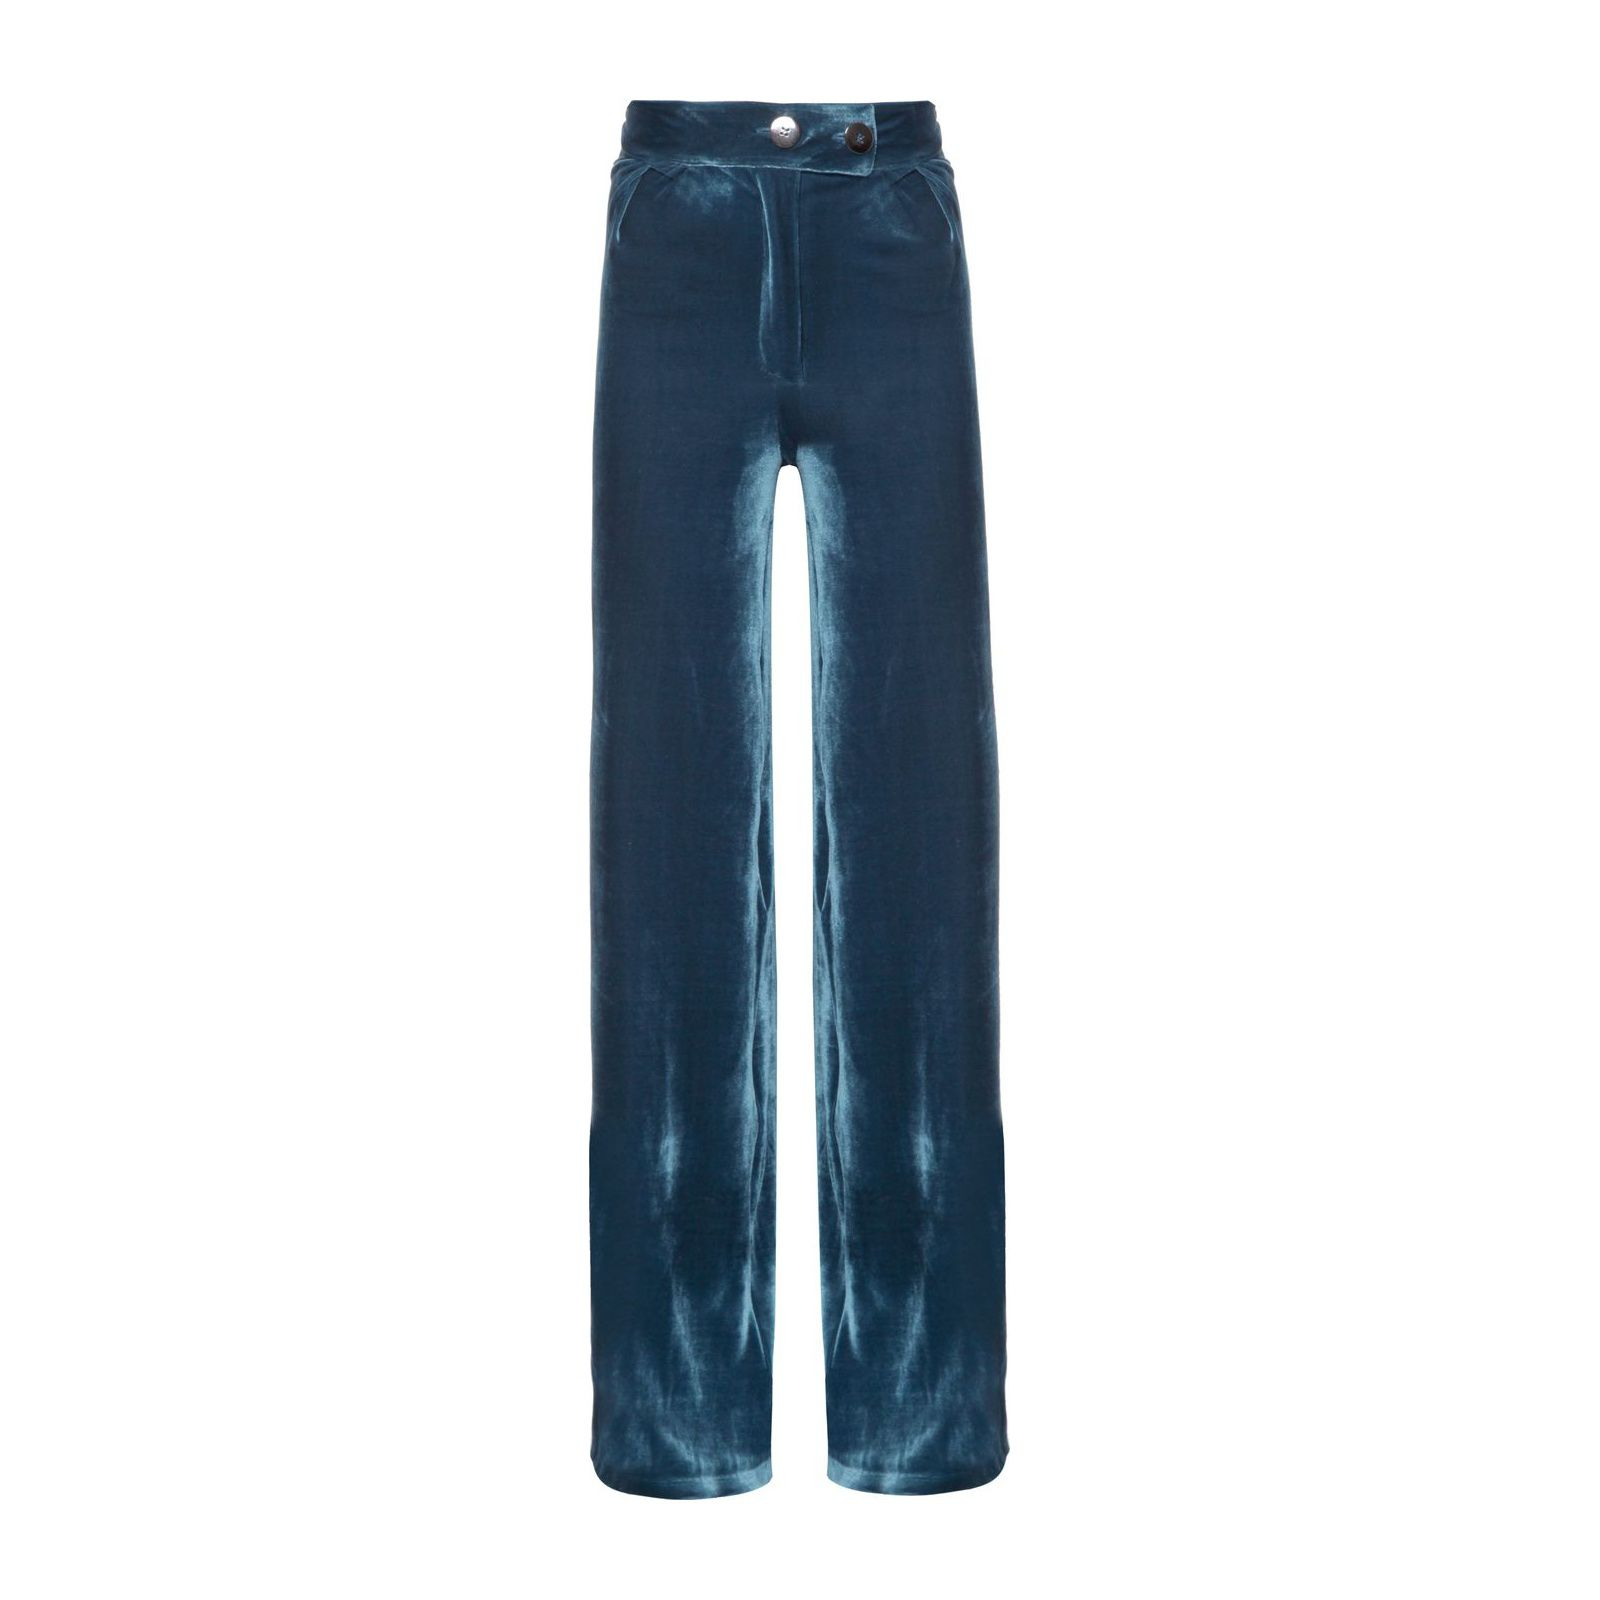 Calça Pantalona Veludo Isabella Fiorentino - Azul